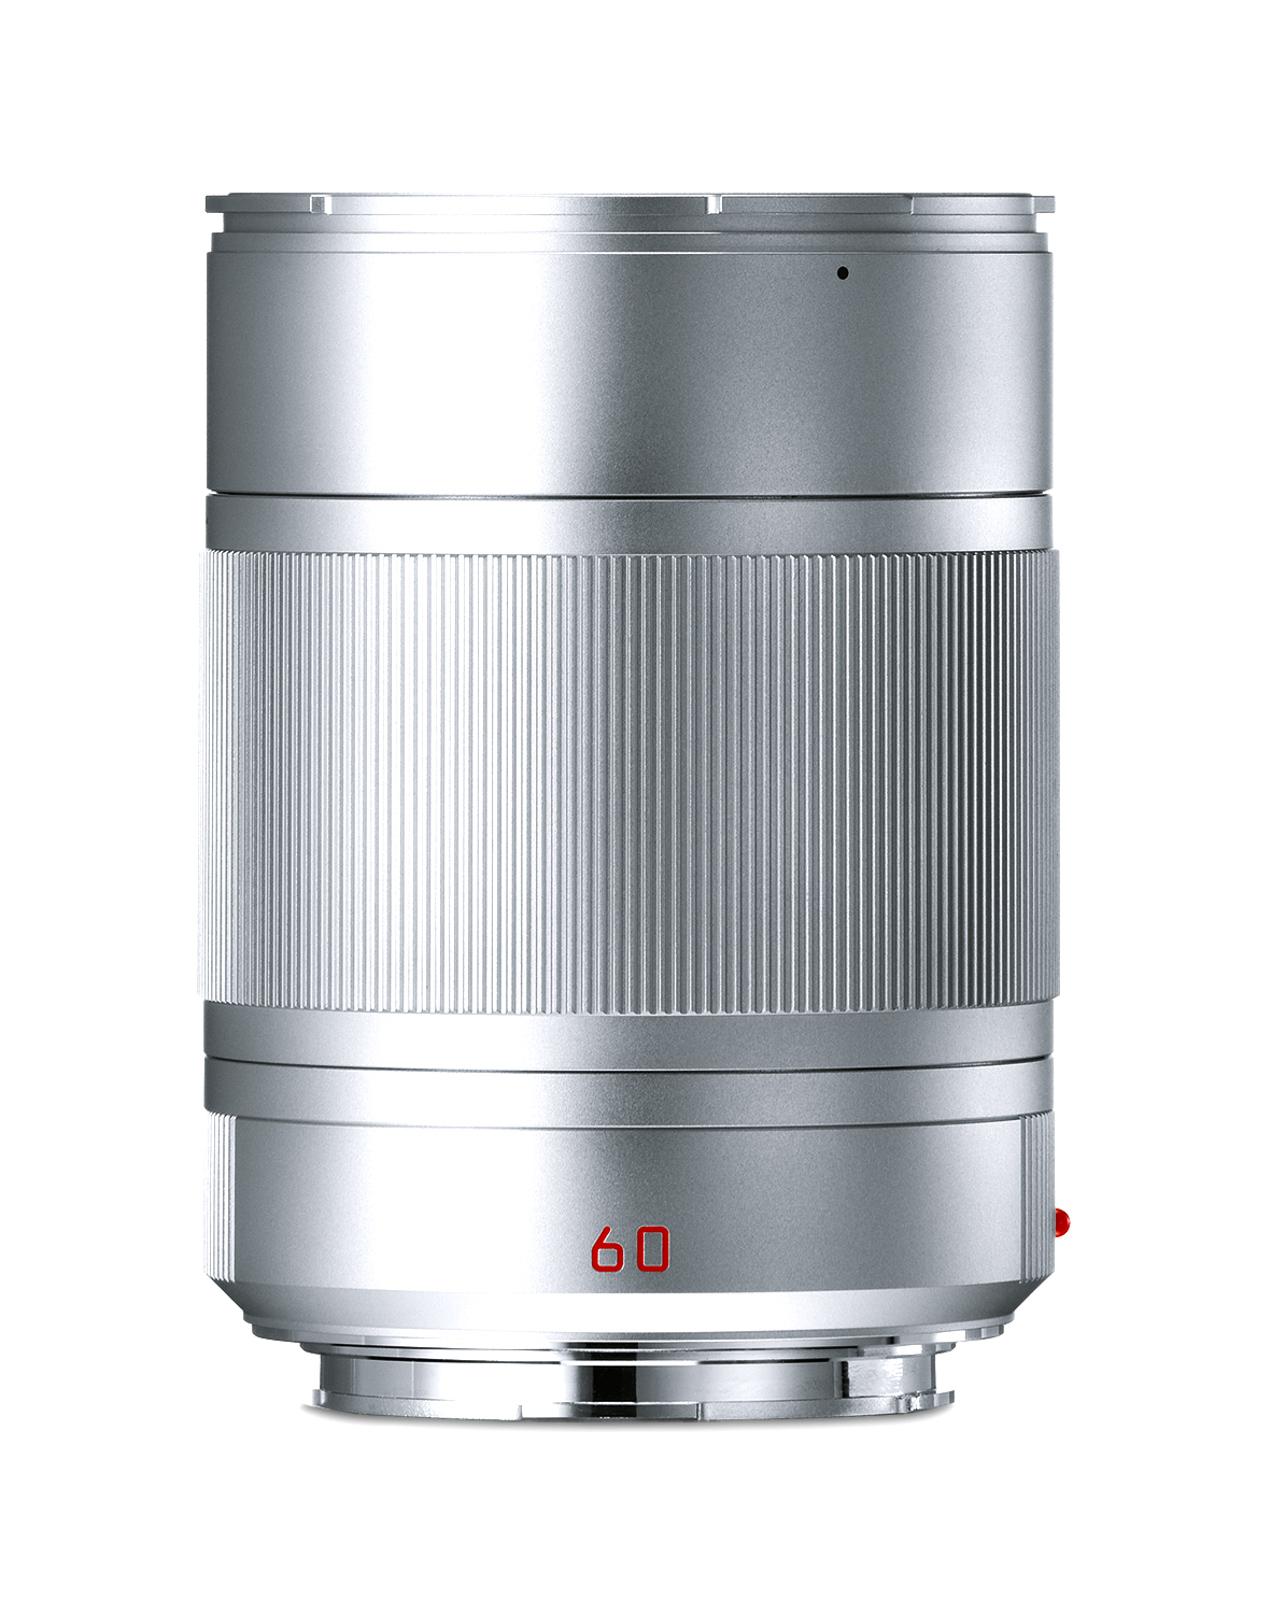 Leica APO-Macro-Elmarit-TL 1:2.8/60 ASPH